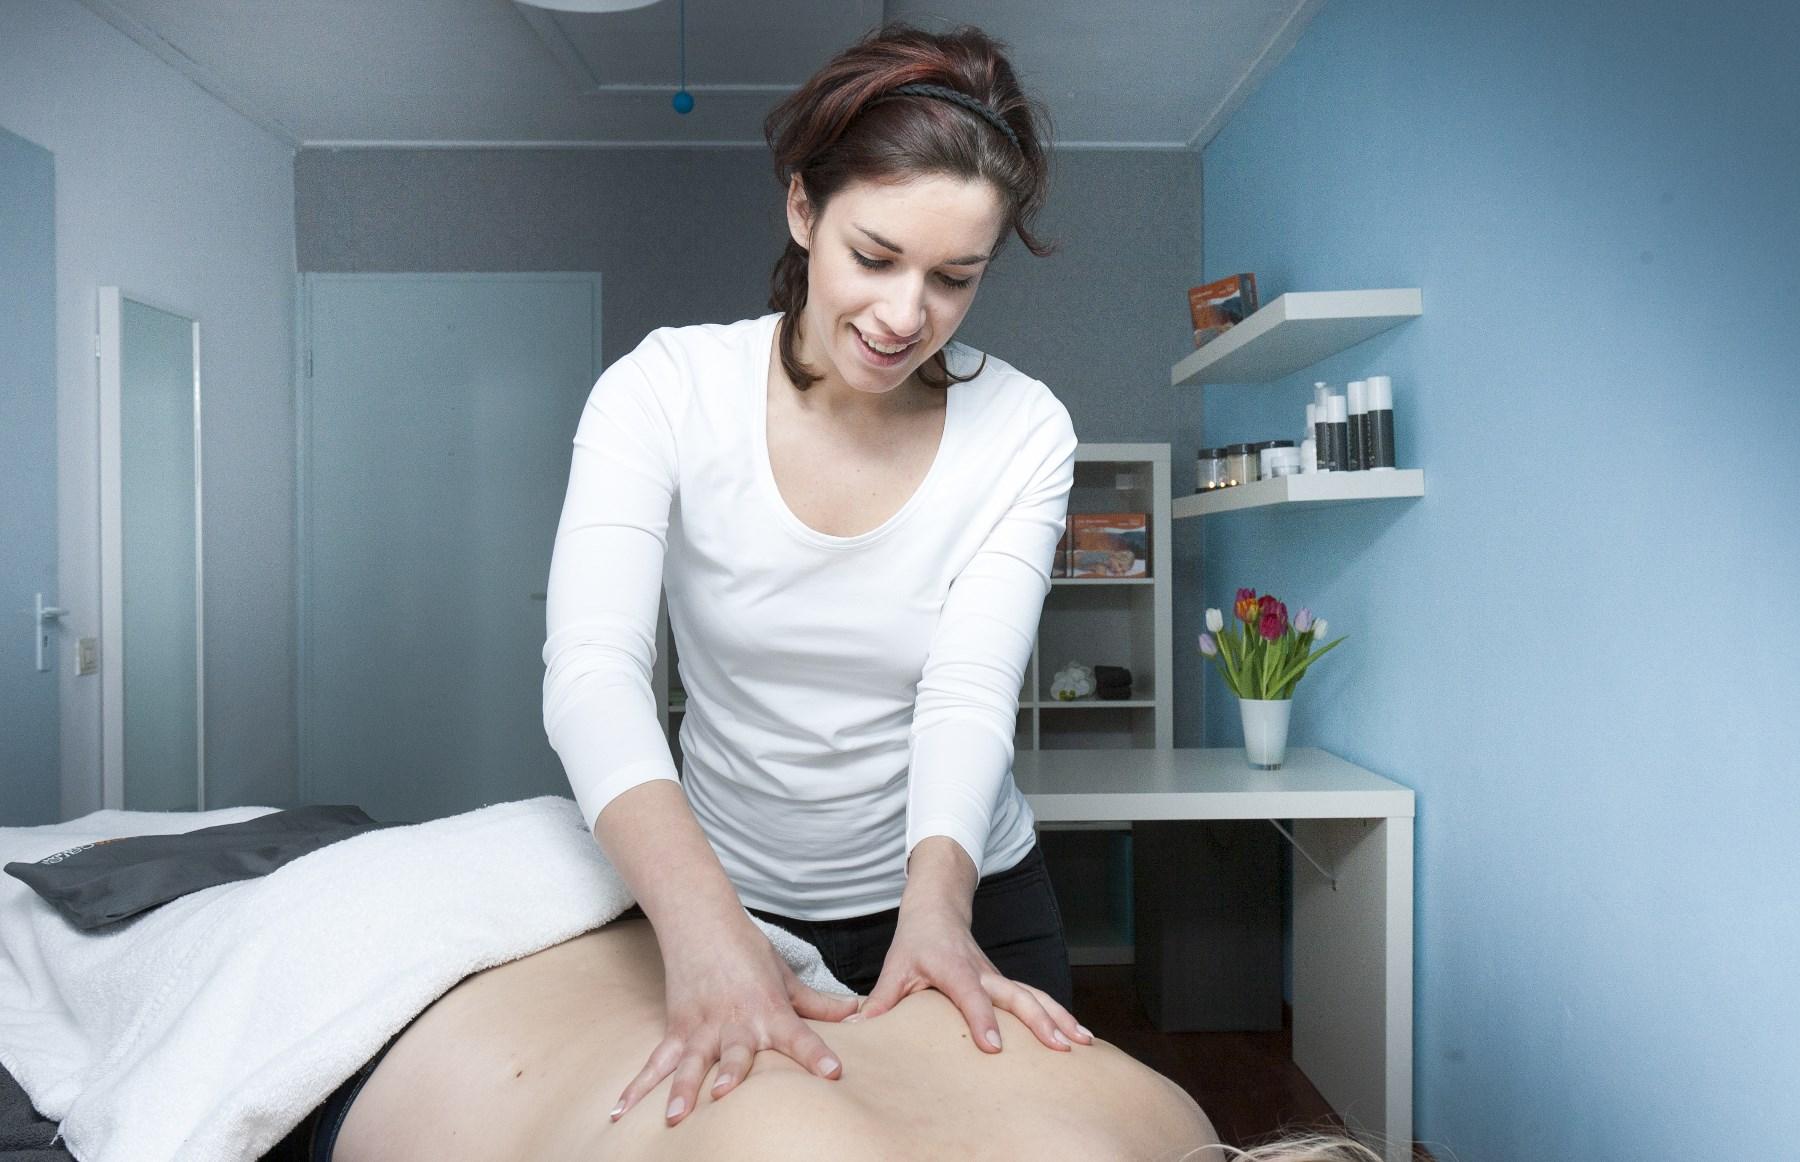 Schoonheidsspecialiste, masseuse Natuurlijk Kim Raamsdonksveer - wellness massage ontspanning reiniging